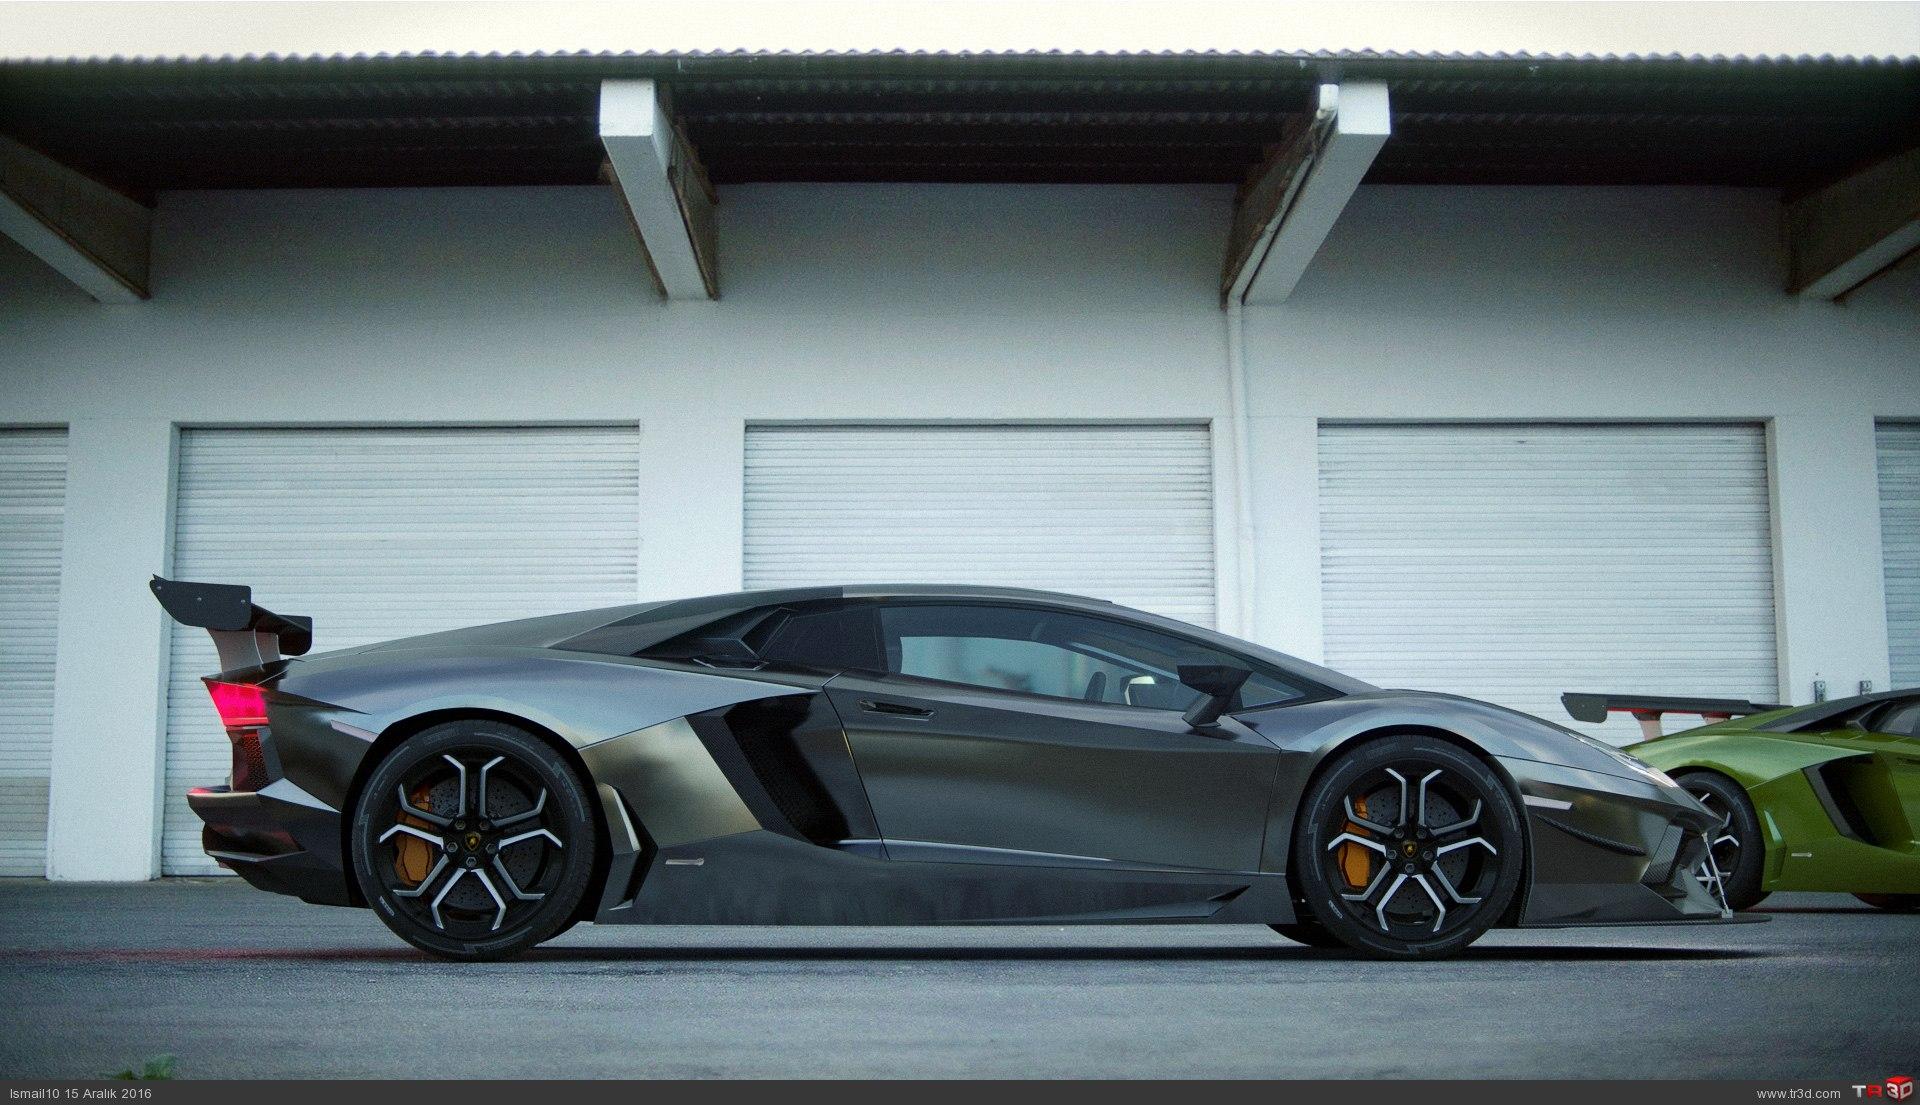 Lamborghini Aventador LP700-4_arkaplan 1